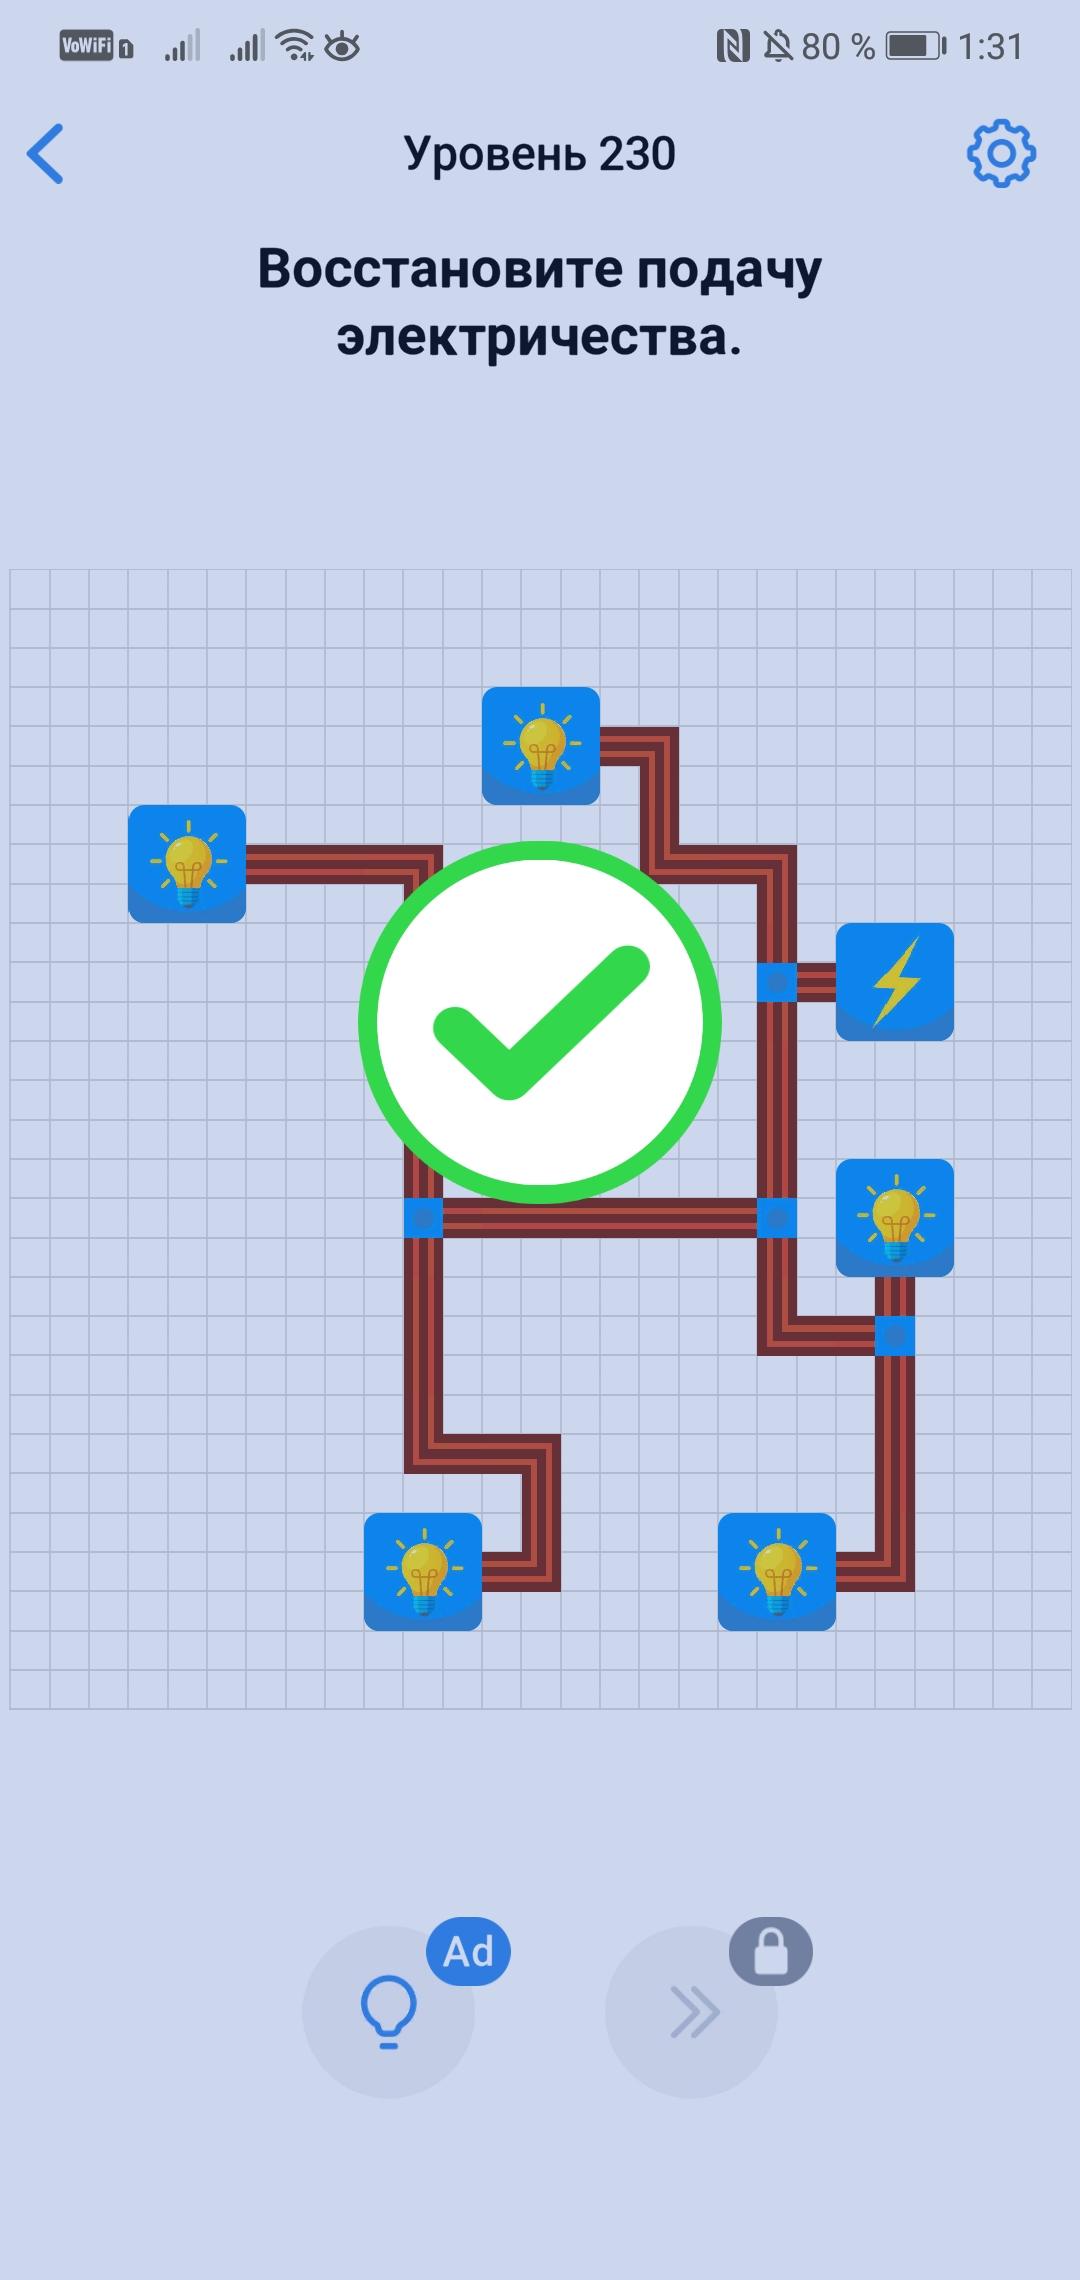 Easy Game - 230 уровень - Восстановите подачу электричества.